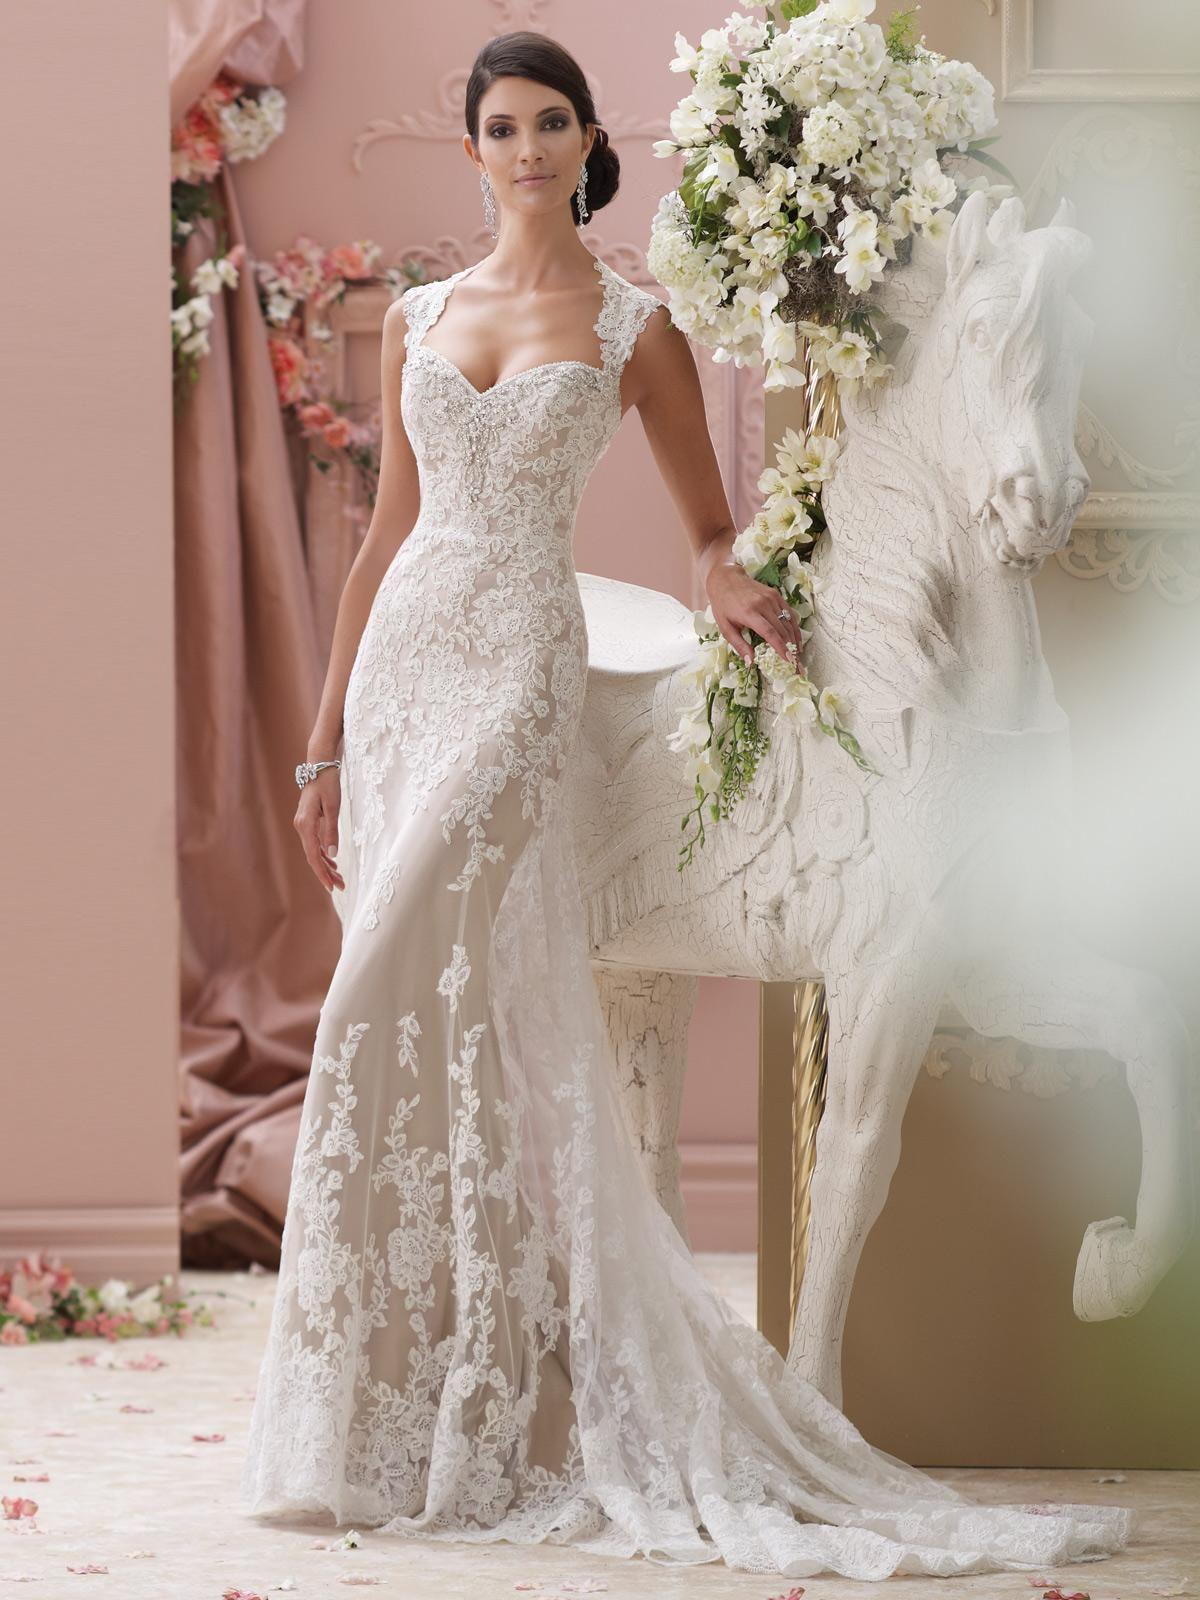 Deep Queen Anne Neckline Keyhole Back Slim A Line Wedding Dress